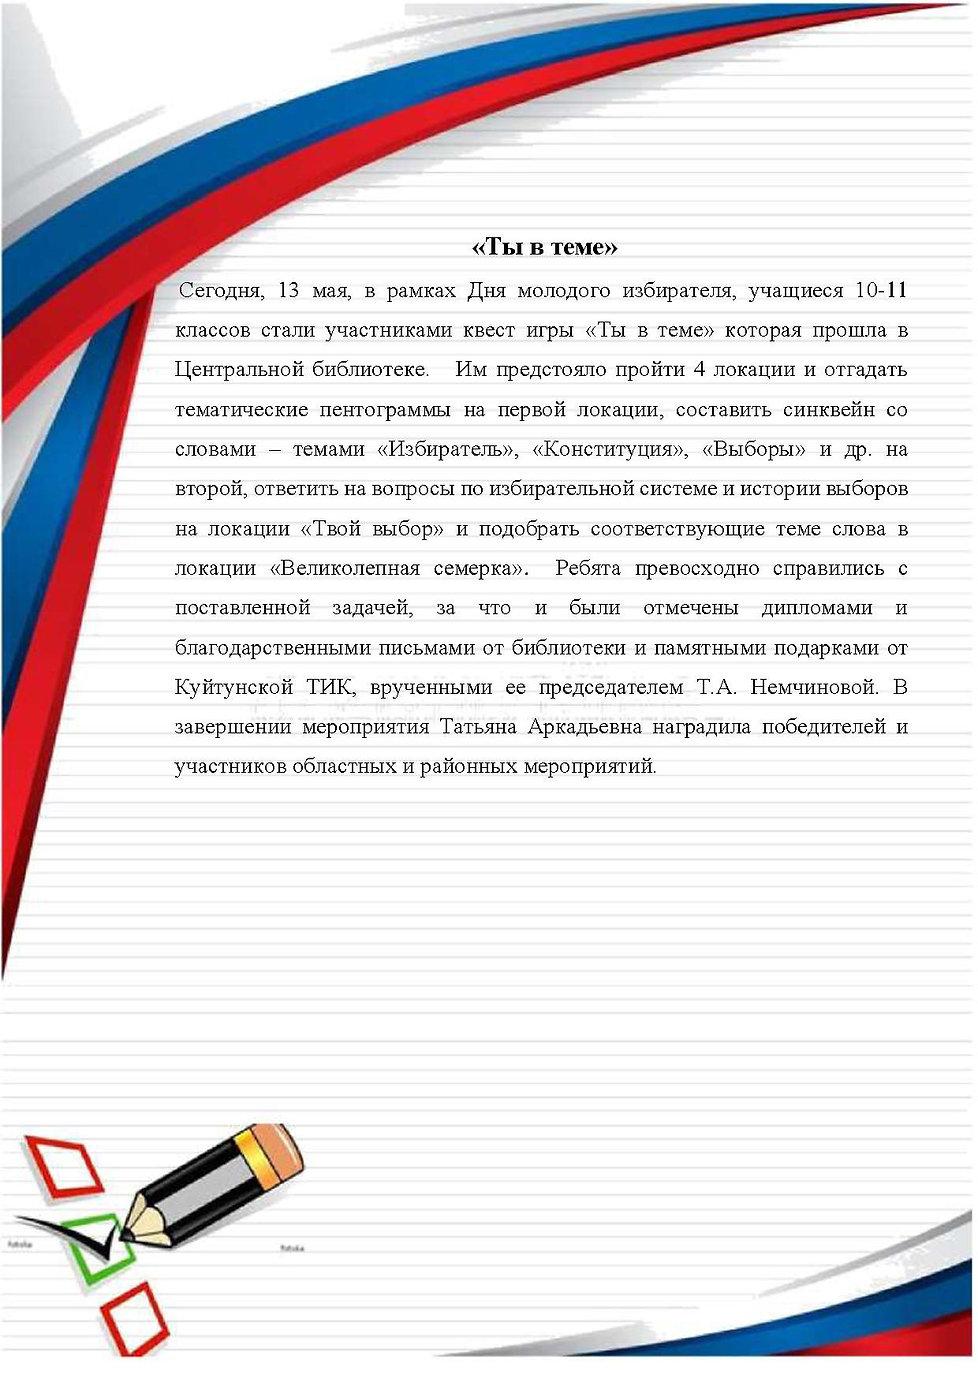 Microsoft Word Document (1).jpg